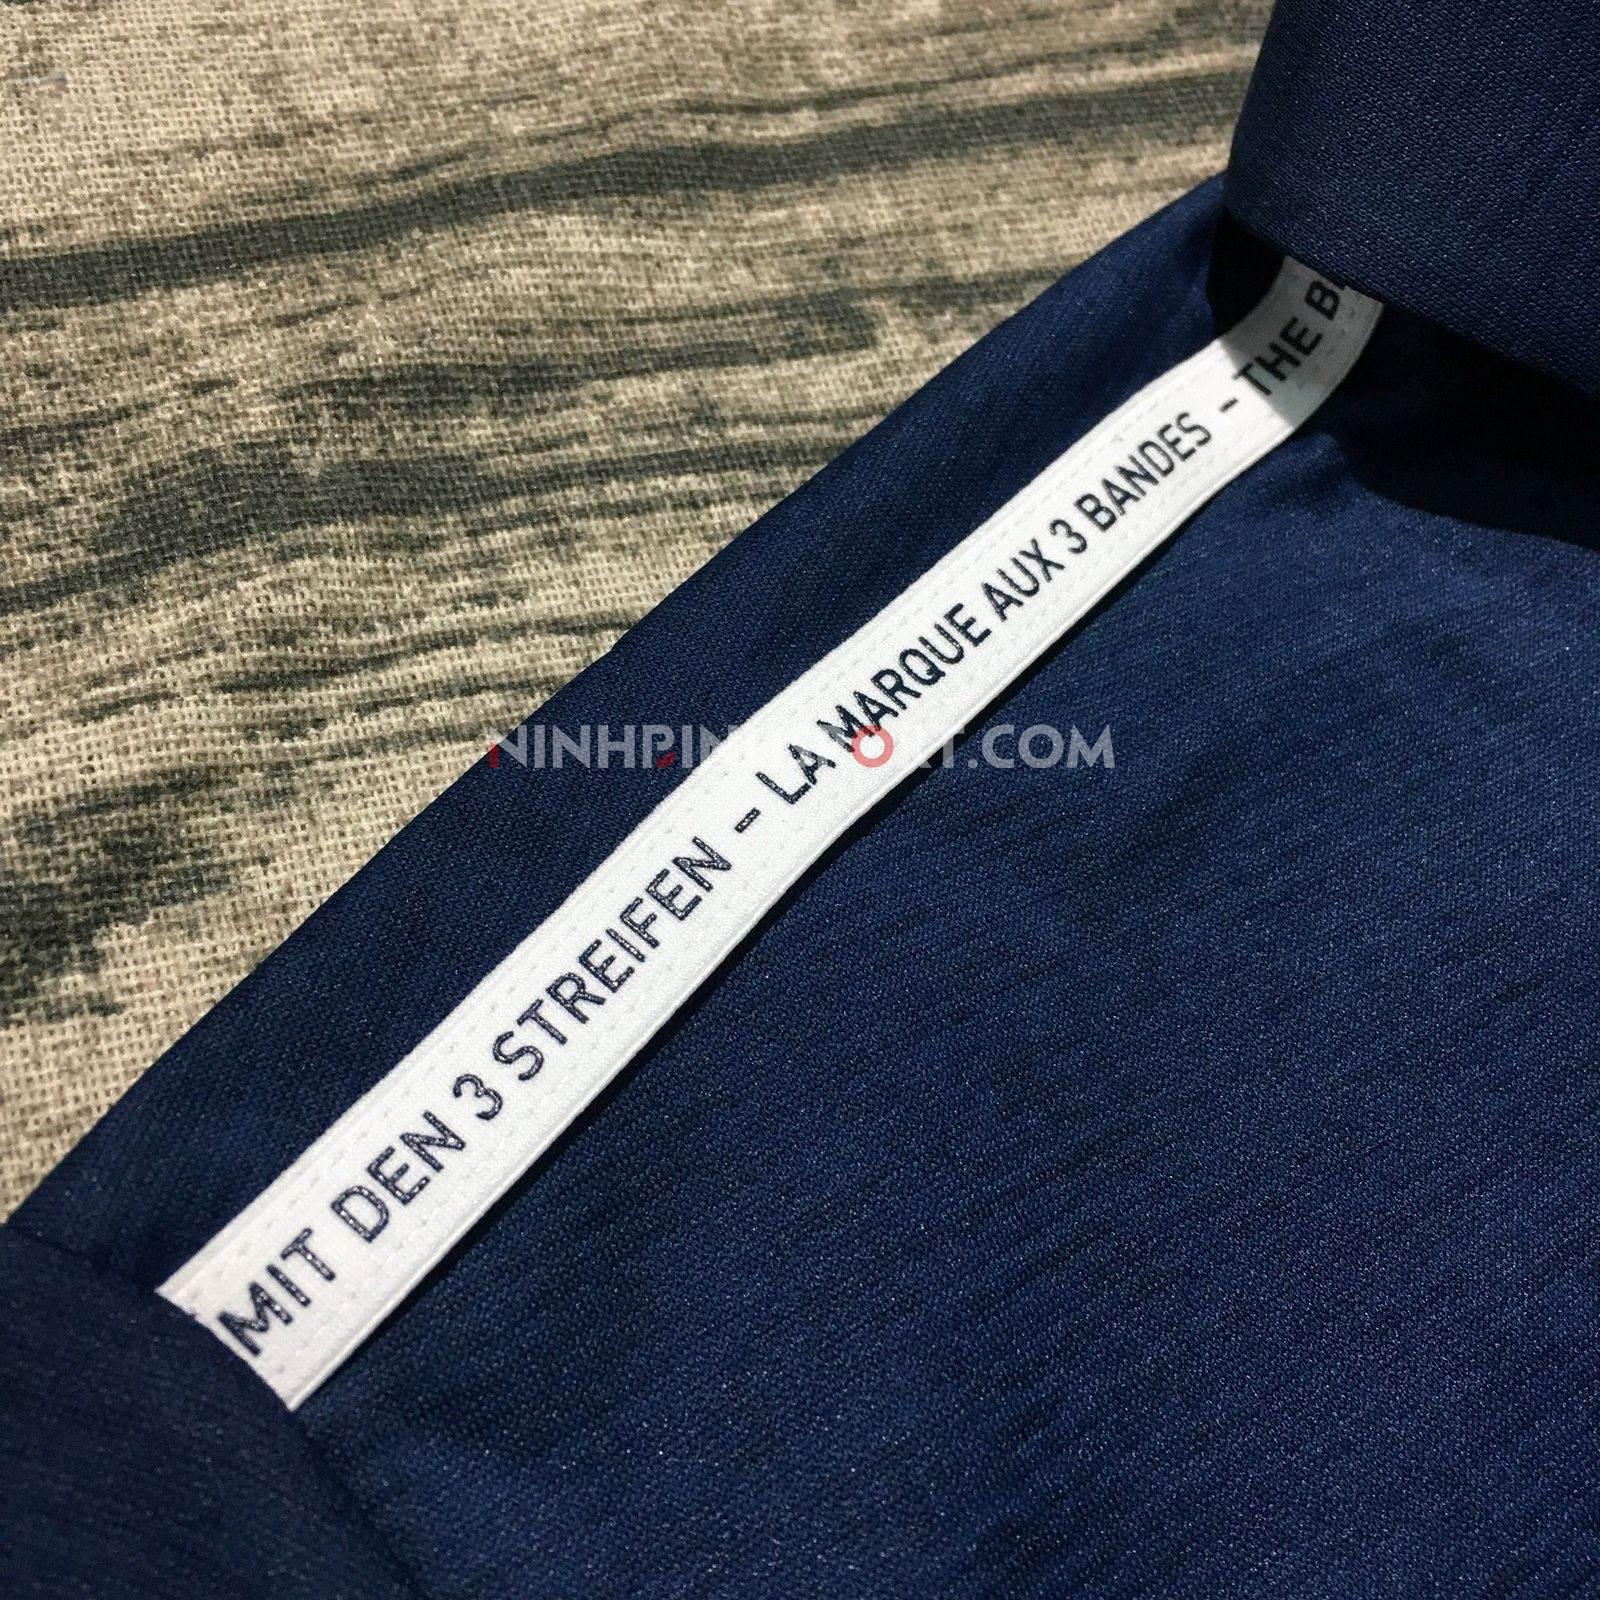 Áo thể thao nam Adidas Golf Adicross Polo Shirt DW5798